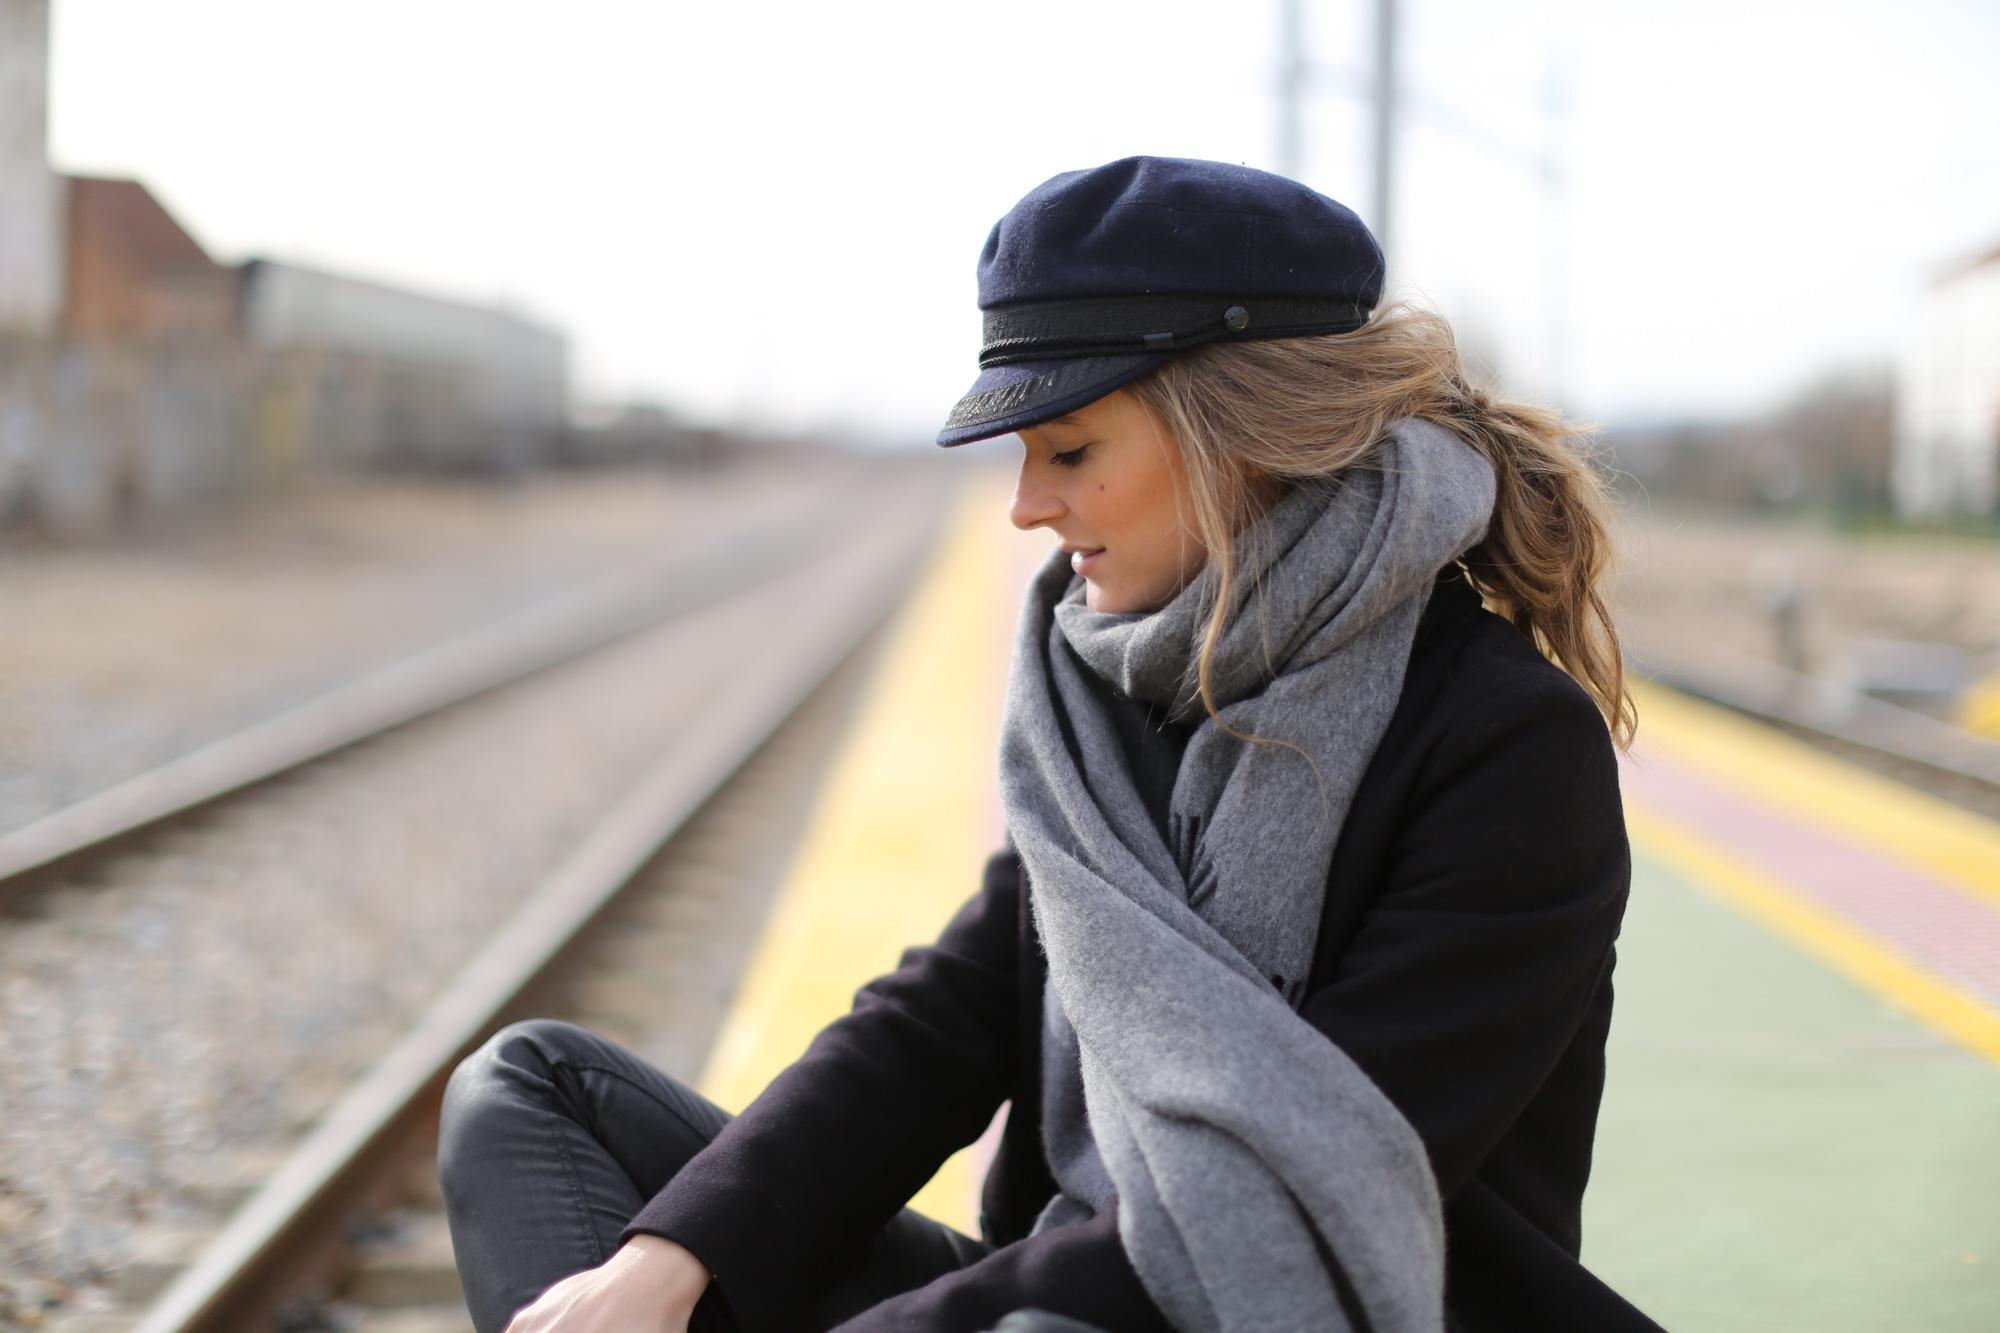 Clochet_streetstyle_cos_coat_saint_james_hat_adidas_gazelle-1-8